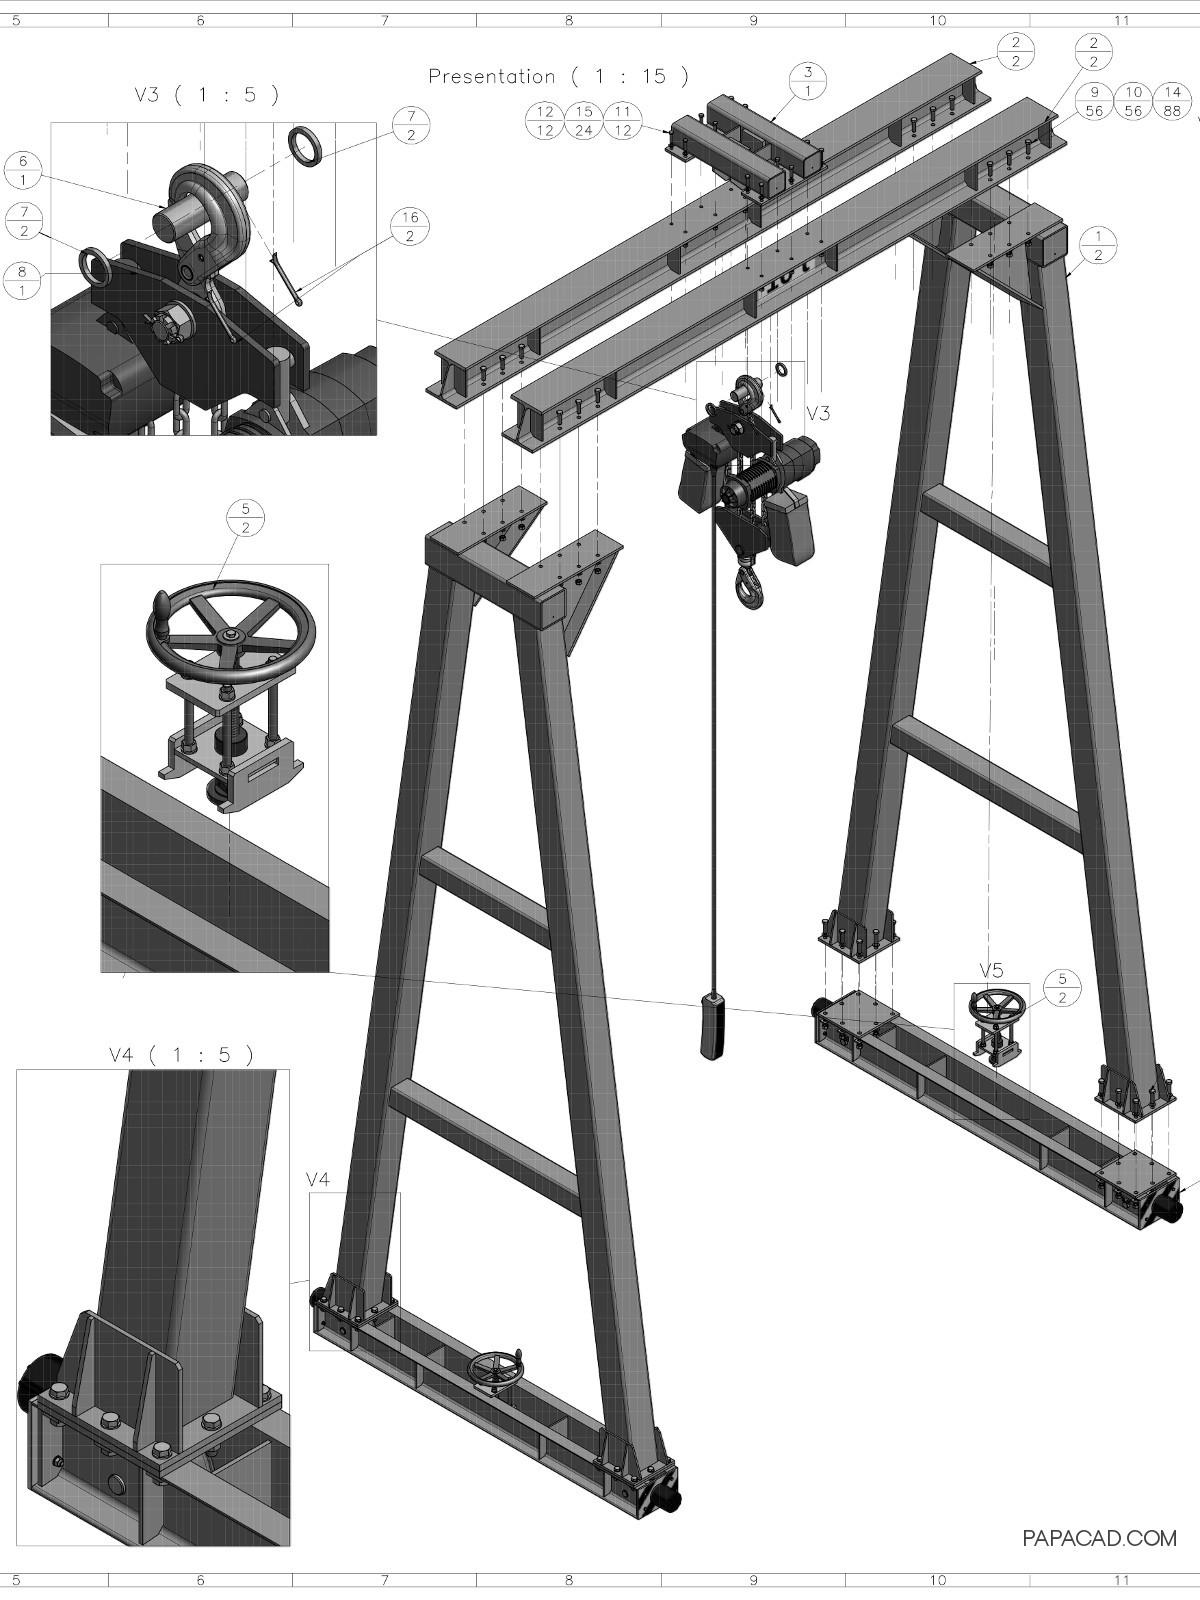 10t Gantry Crane 3D drawings